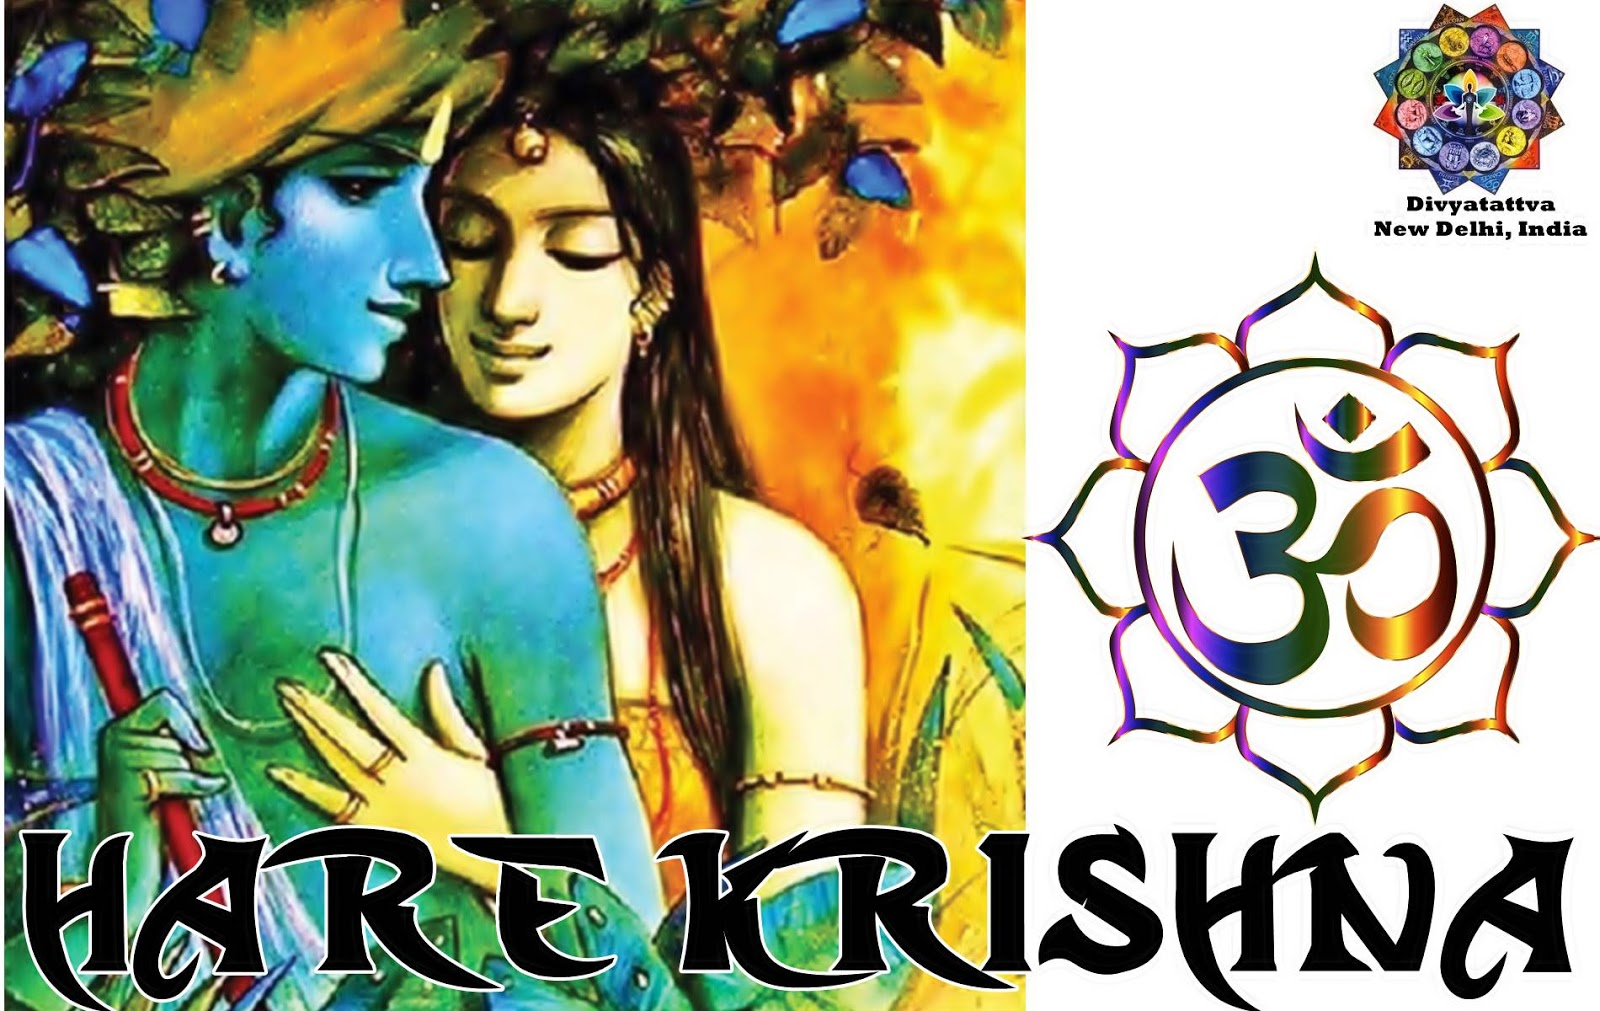 hare krishna wallpaper backgrounds images hindu god spiritual religion graphics www.divyatattva.in